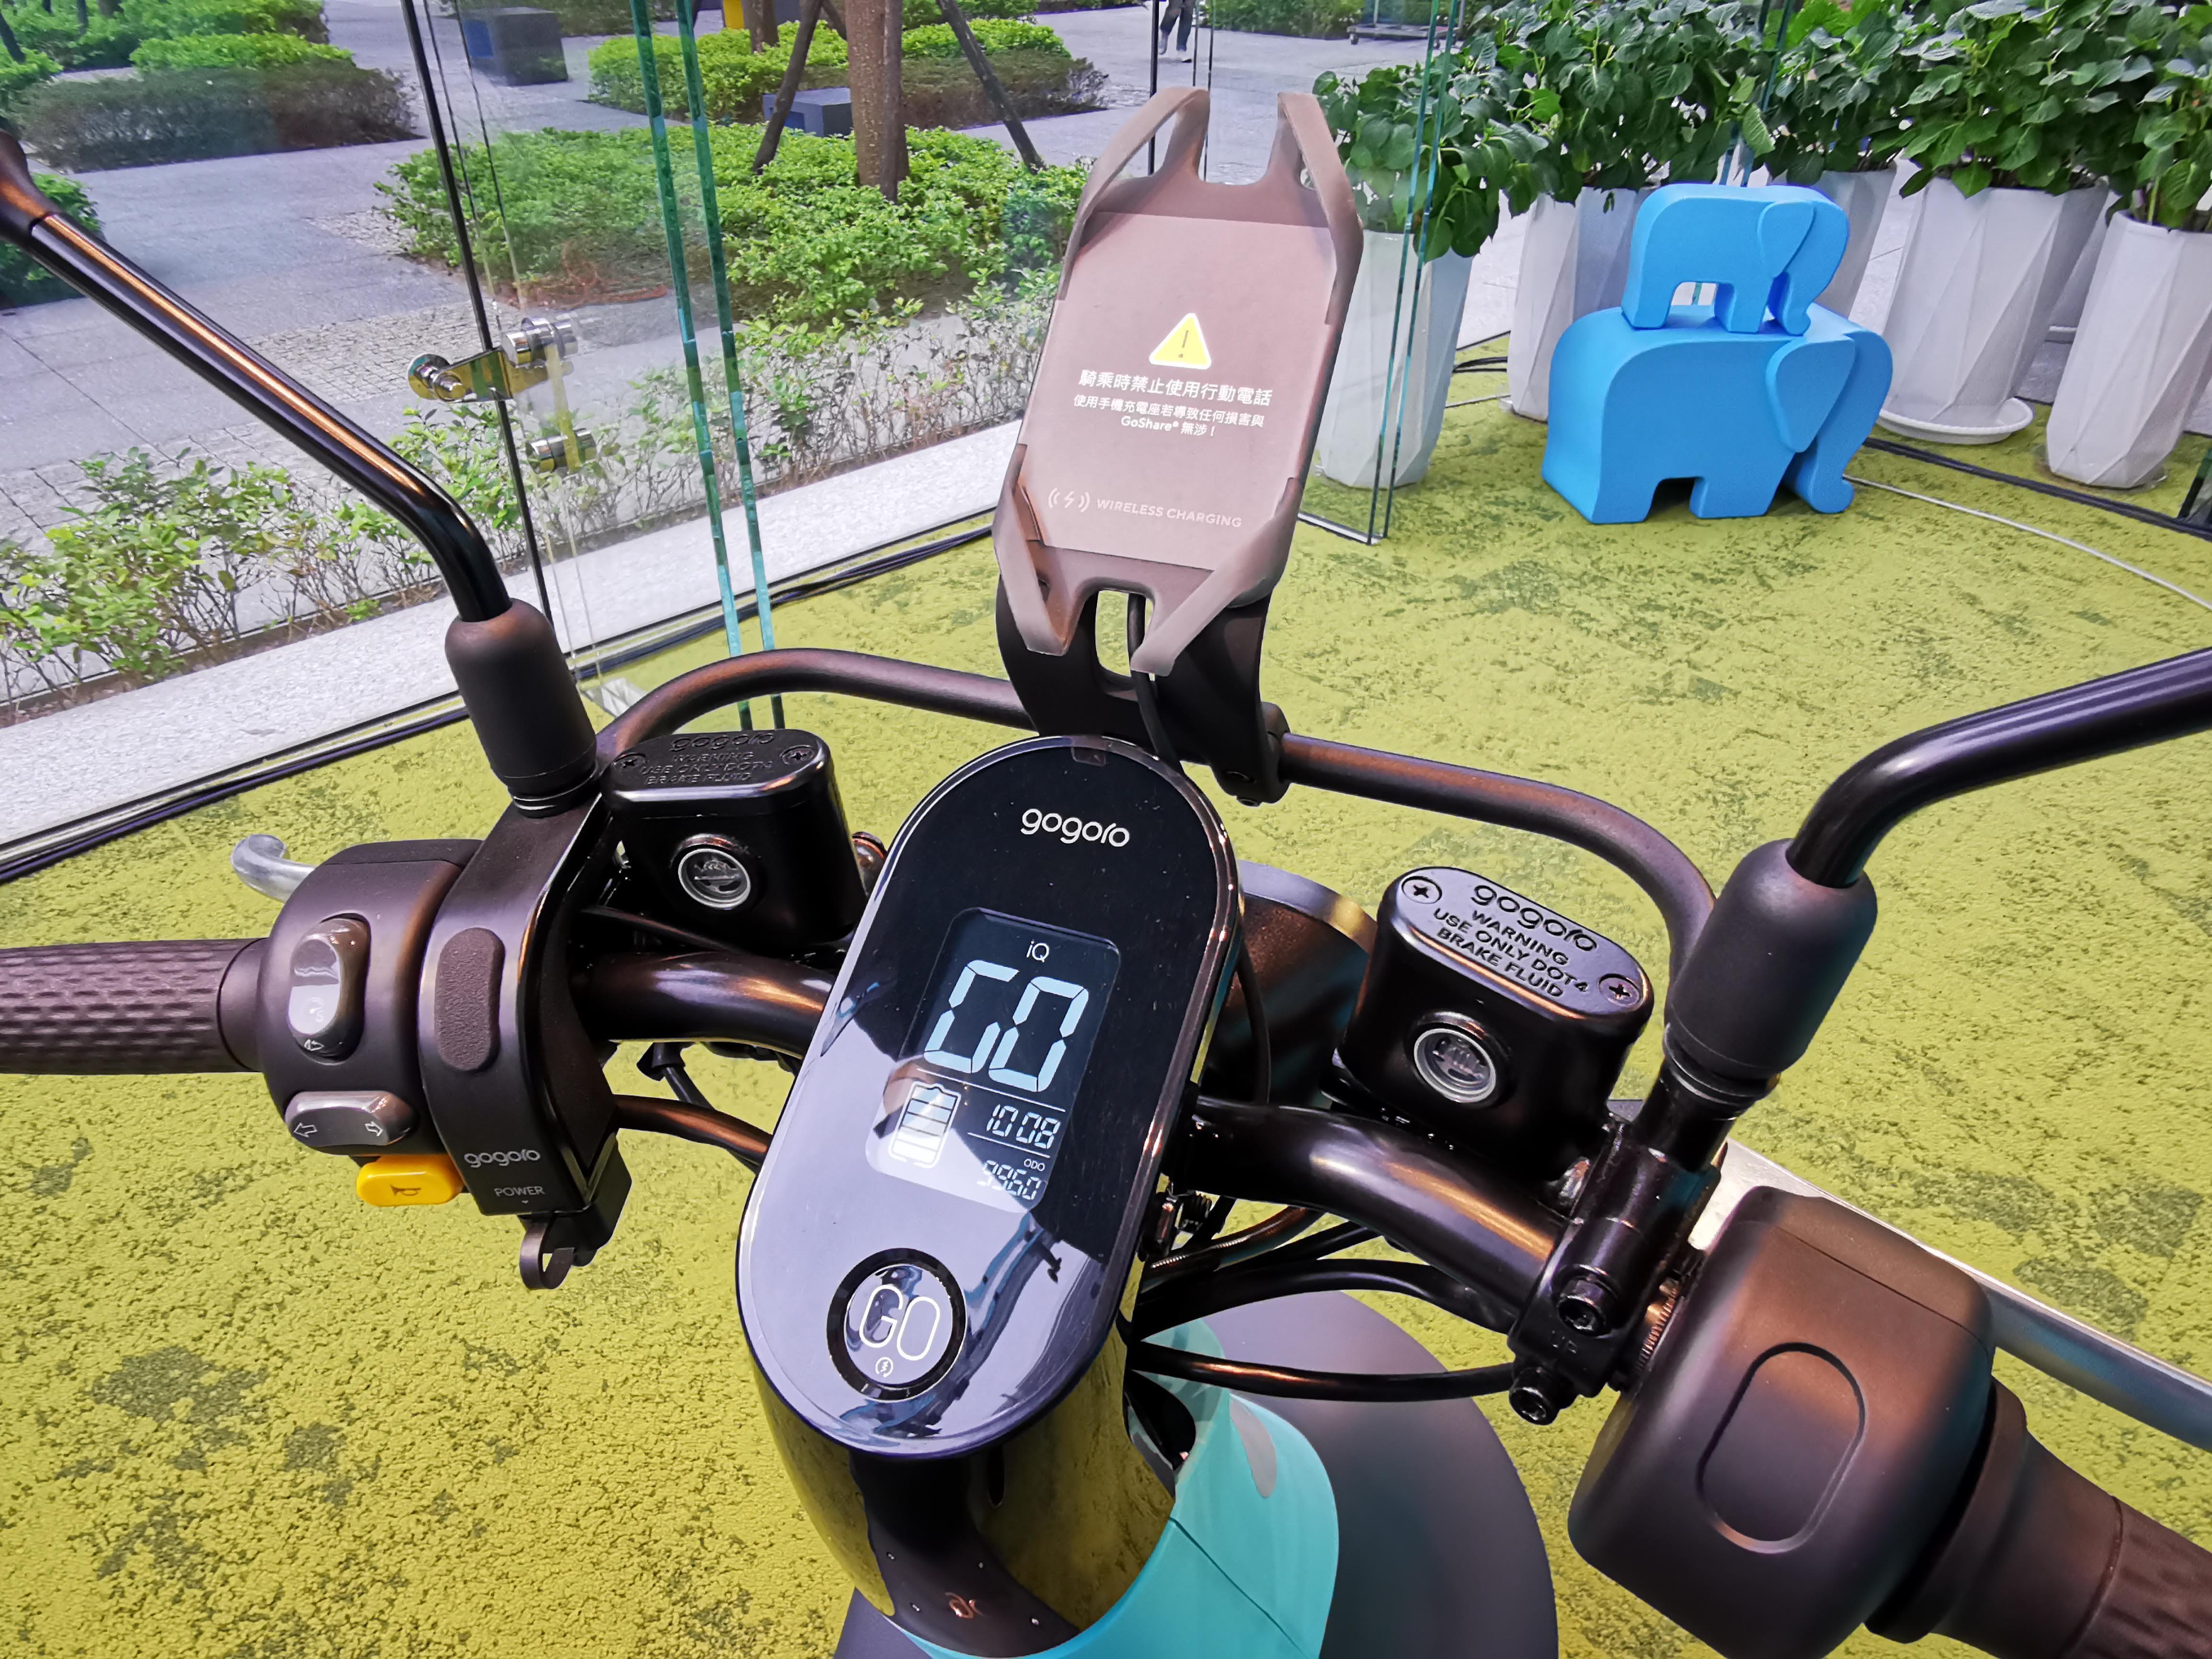 GoShare 這次也很貼心的在 Gogoro VIVA 的手機架上新增了無線充電手機架的配件!